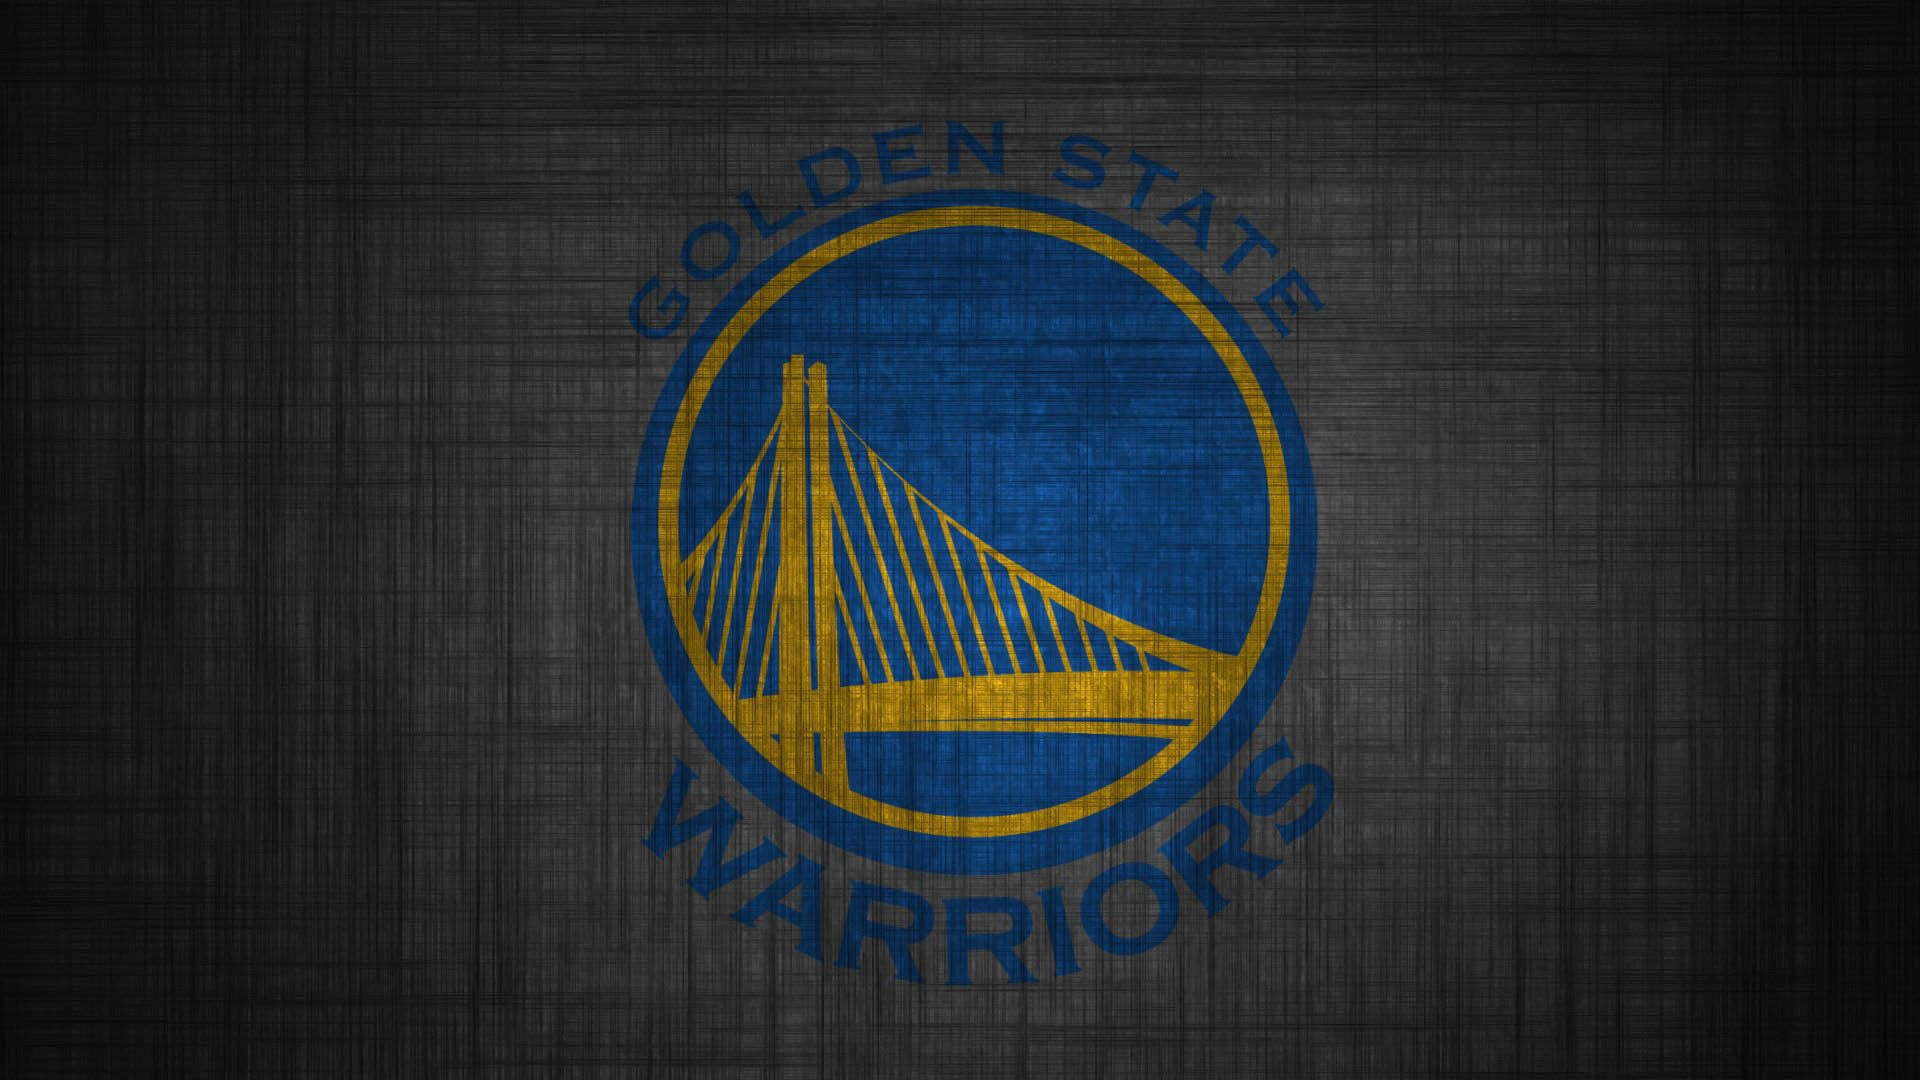 Golden State Warriors Laptop Wallpapers